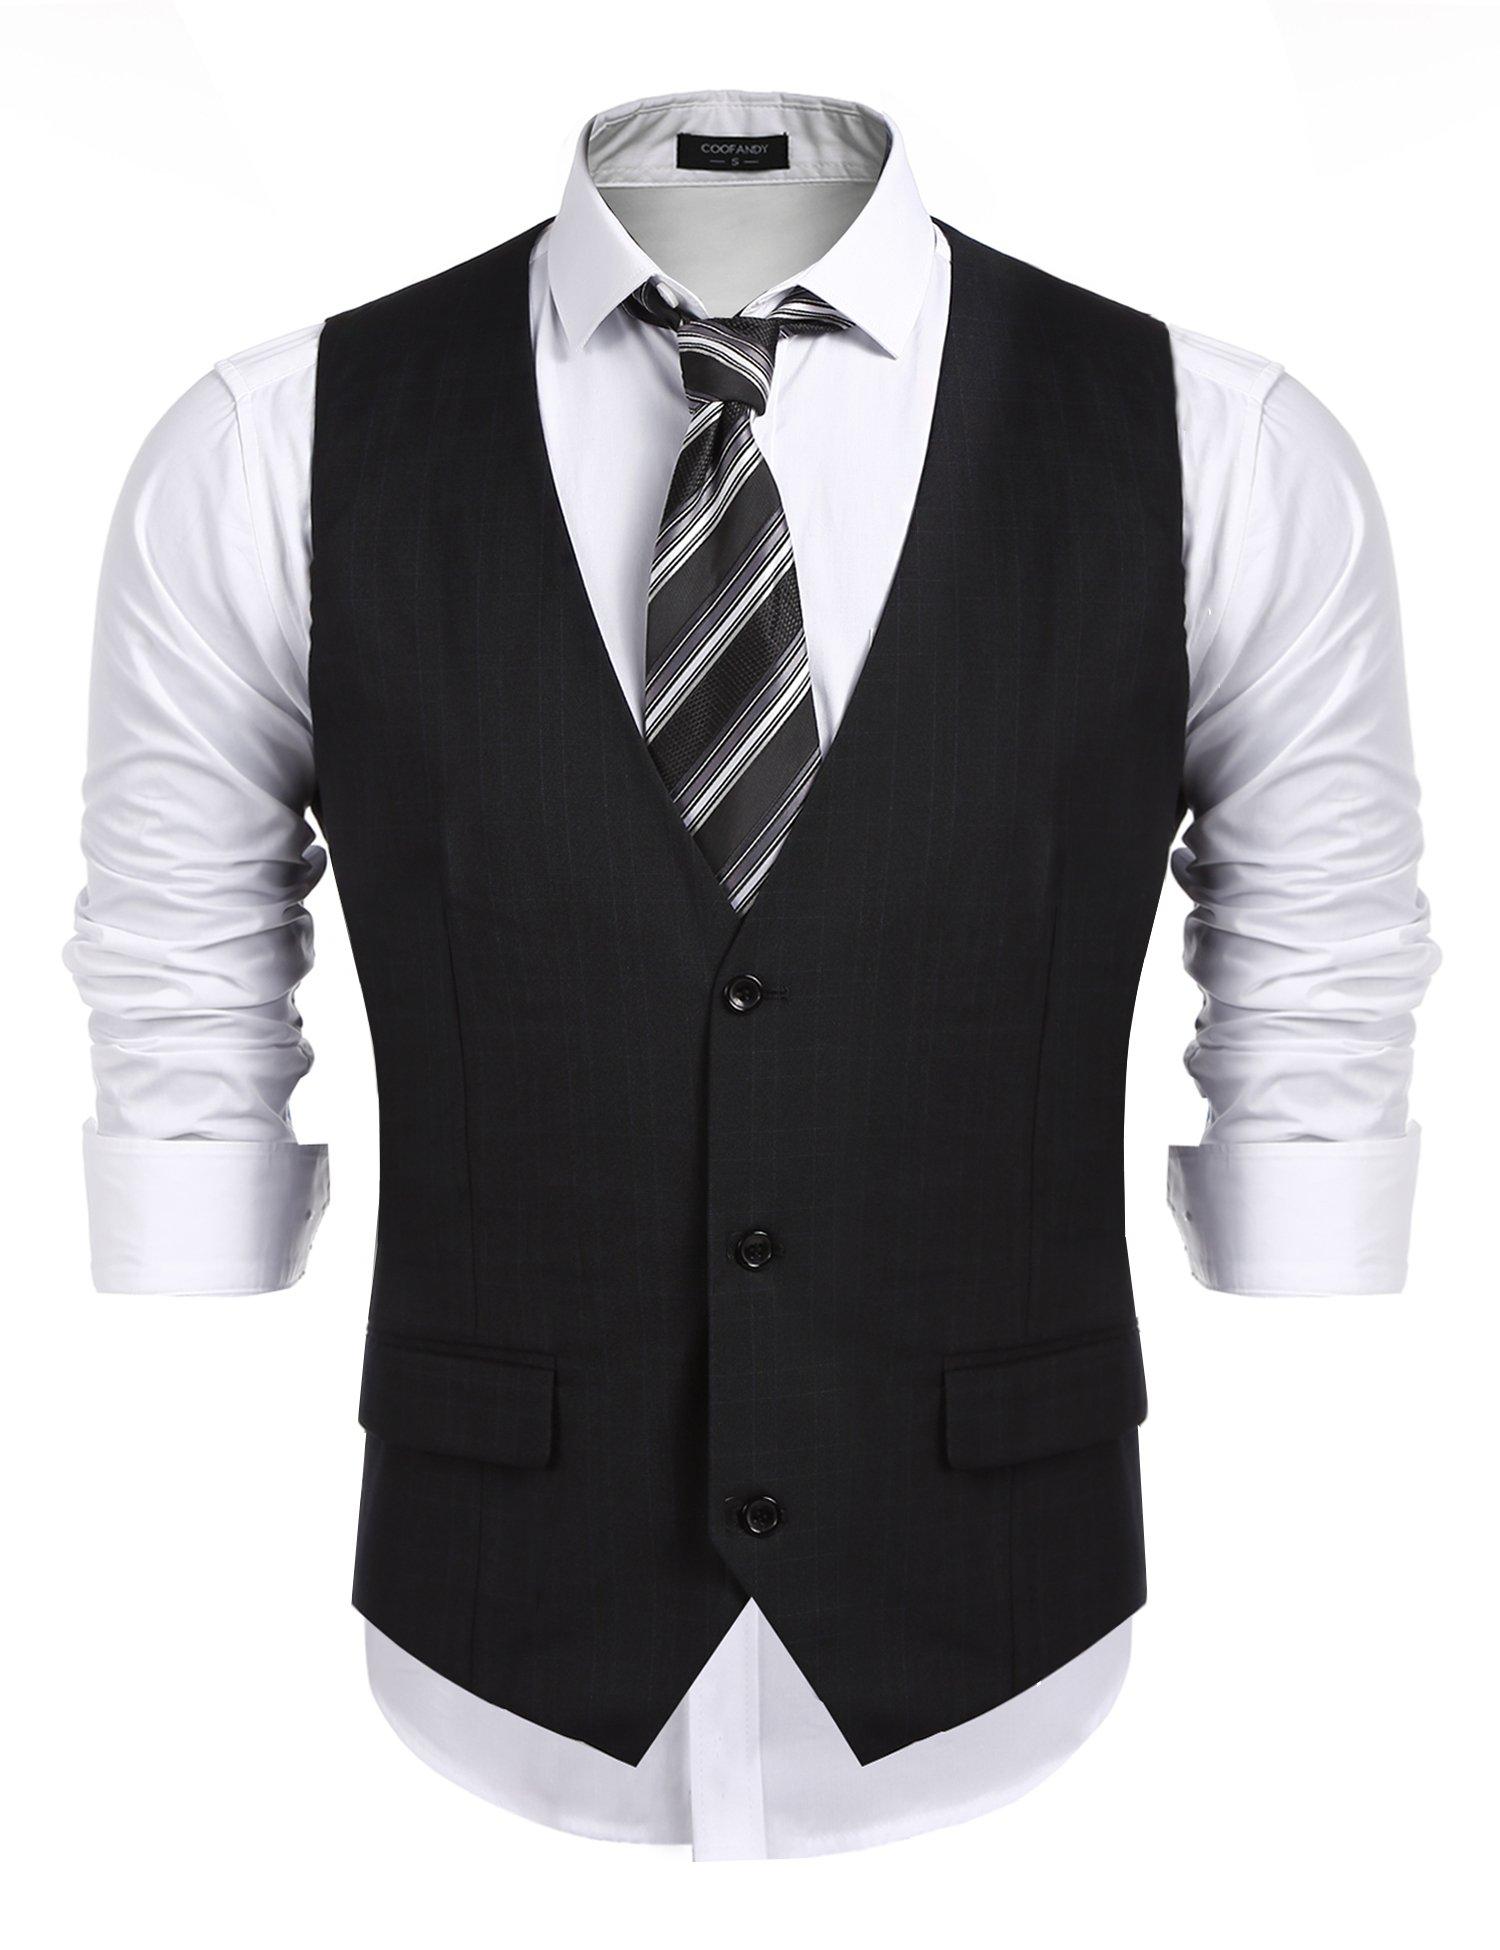 COOFANDY Men's Business Suit Vest,Slim Fit Skinny Wedding Waistcoat, Black, Small